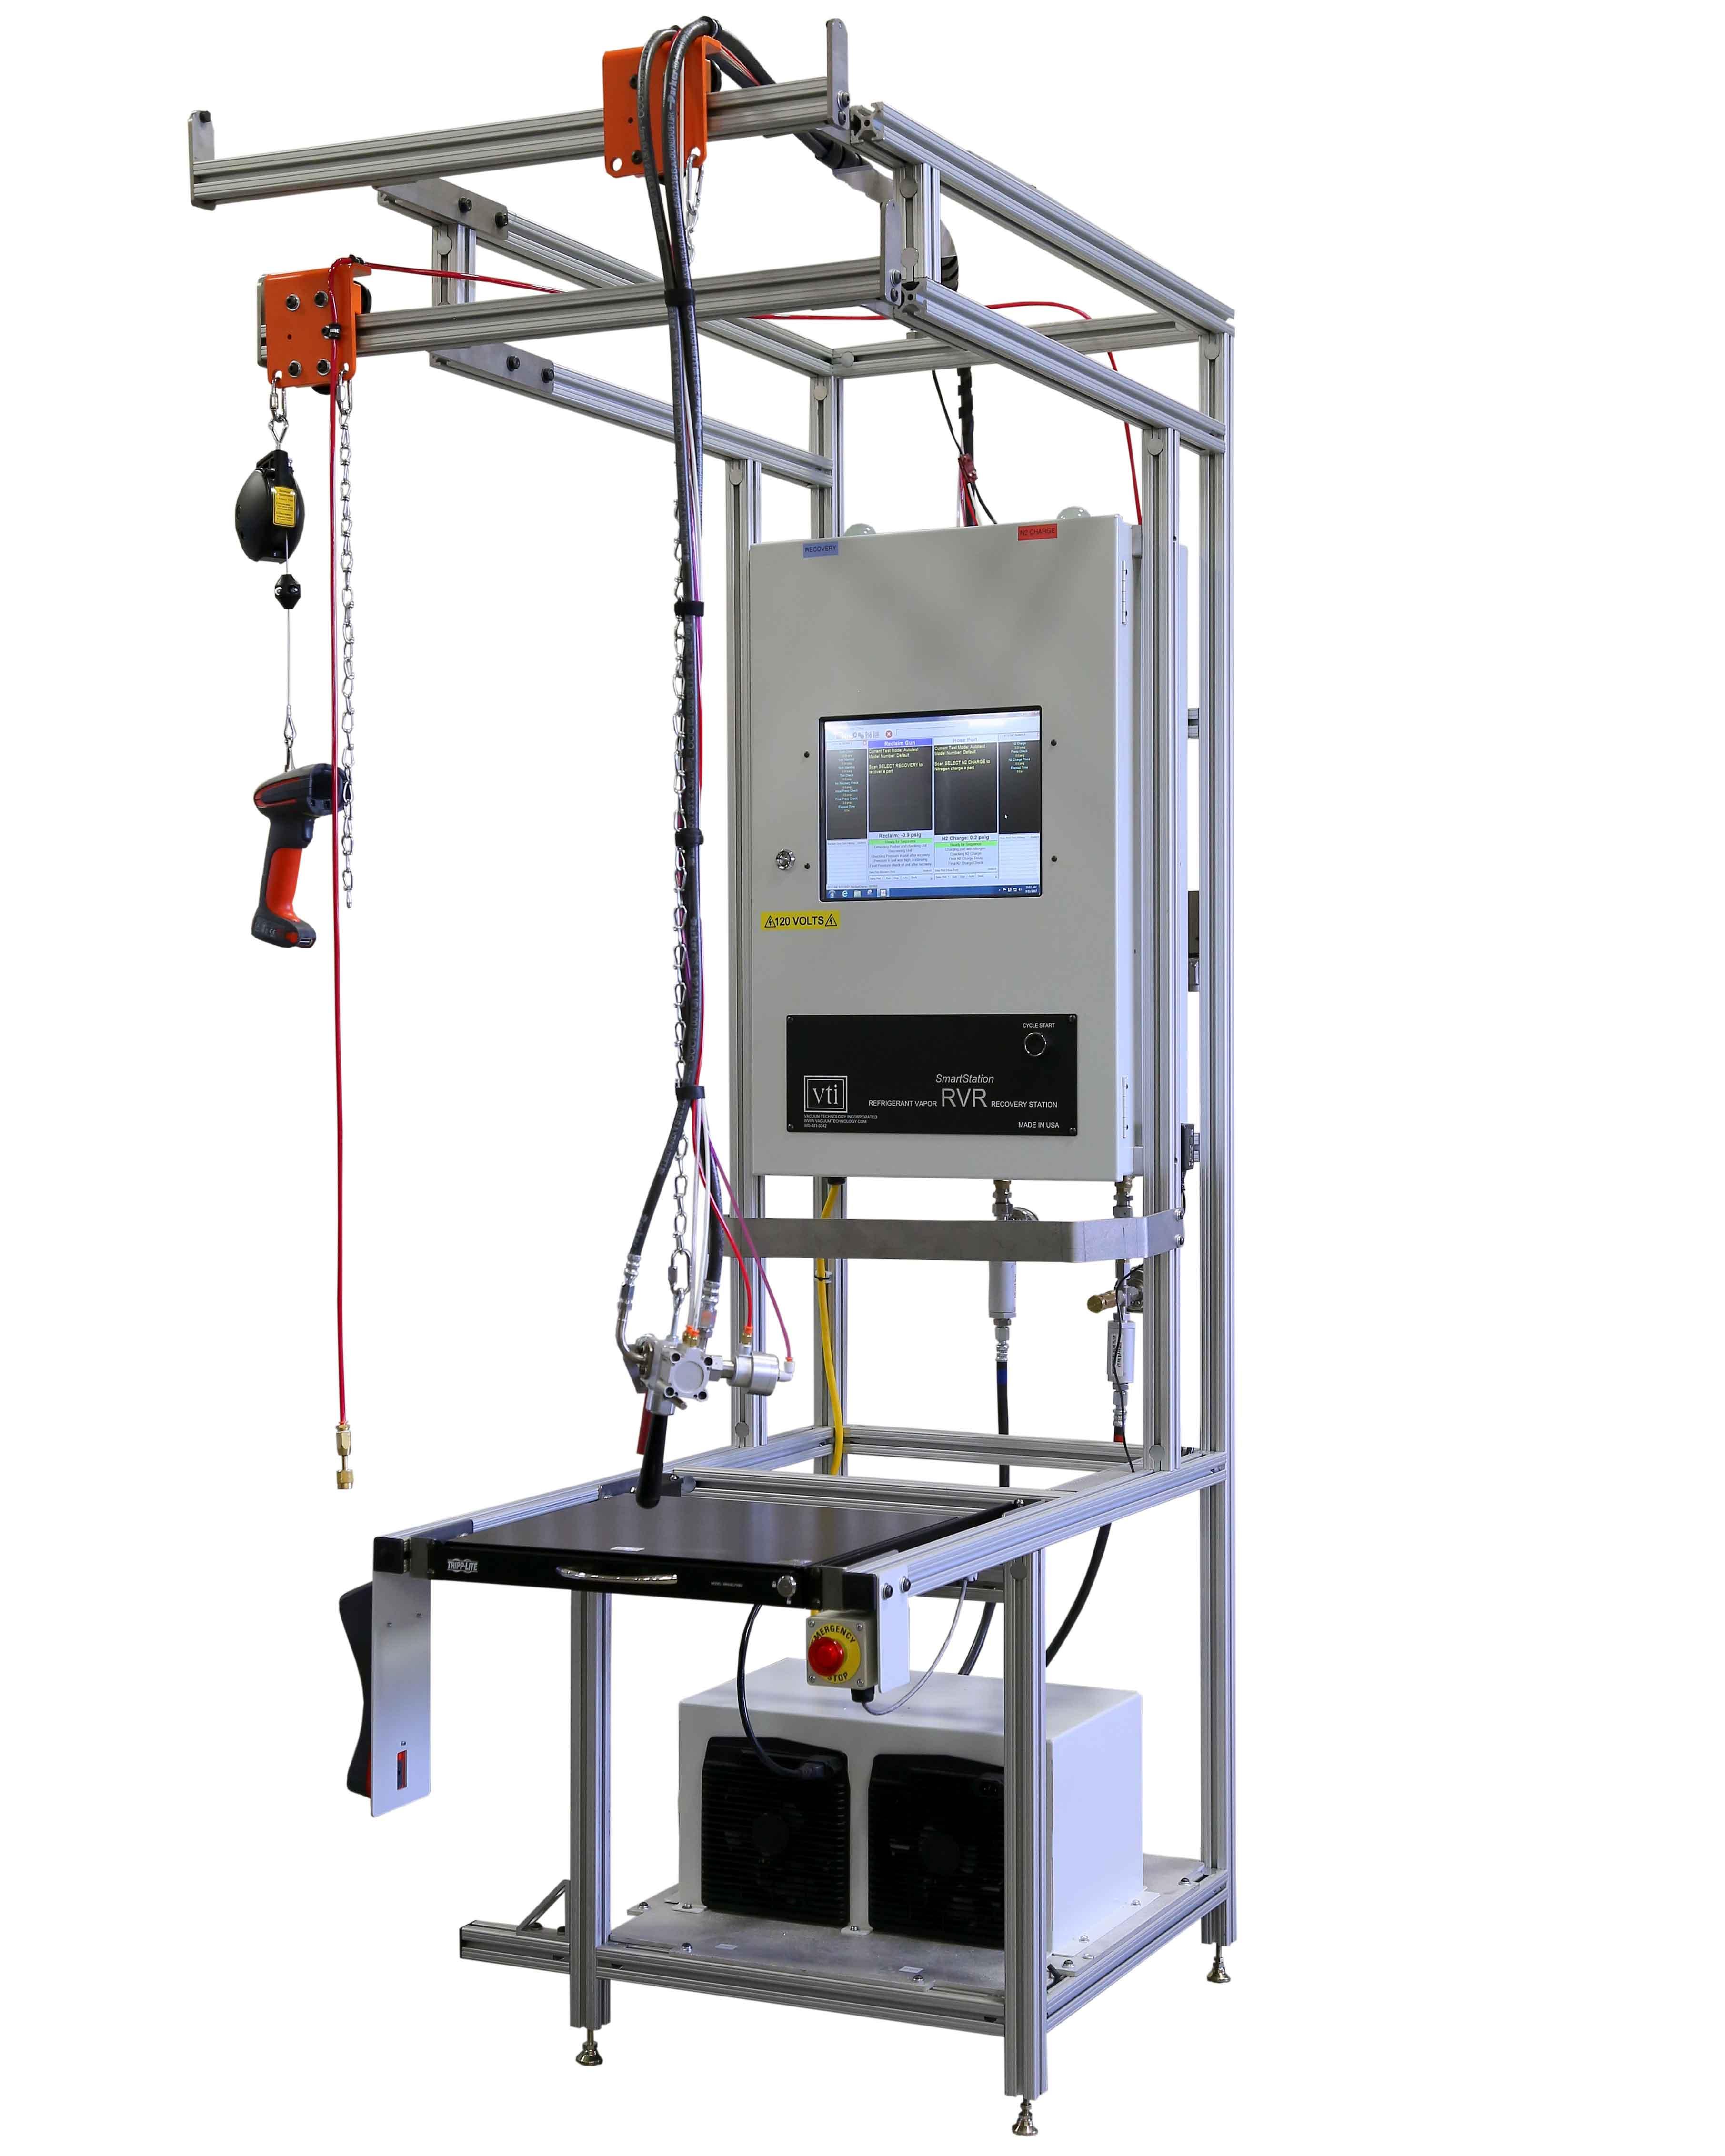 VTI's Refrigerant Vapor Recovery (RVR) System for A-Coil Manufacturing